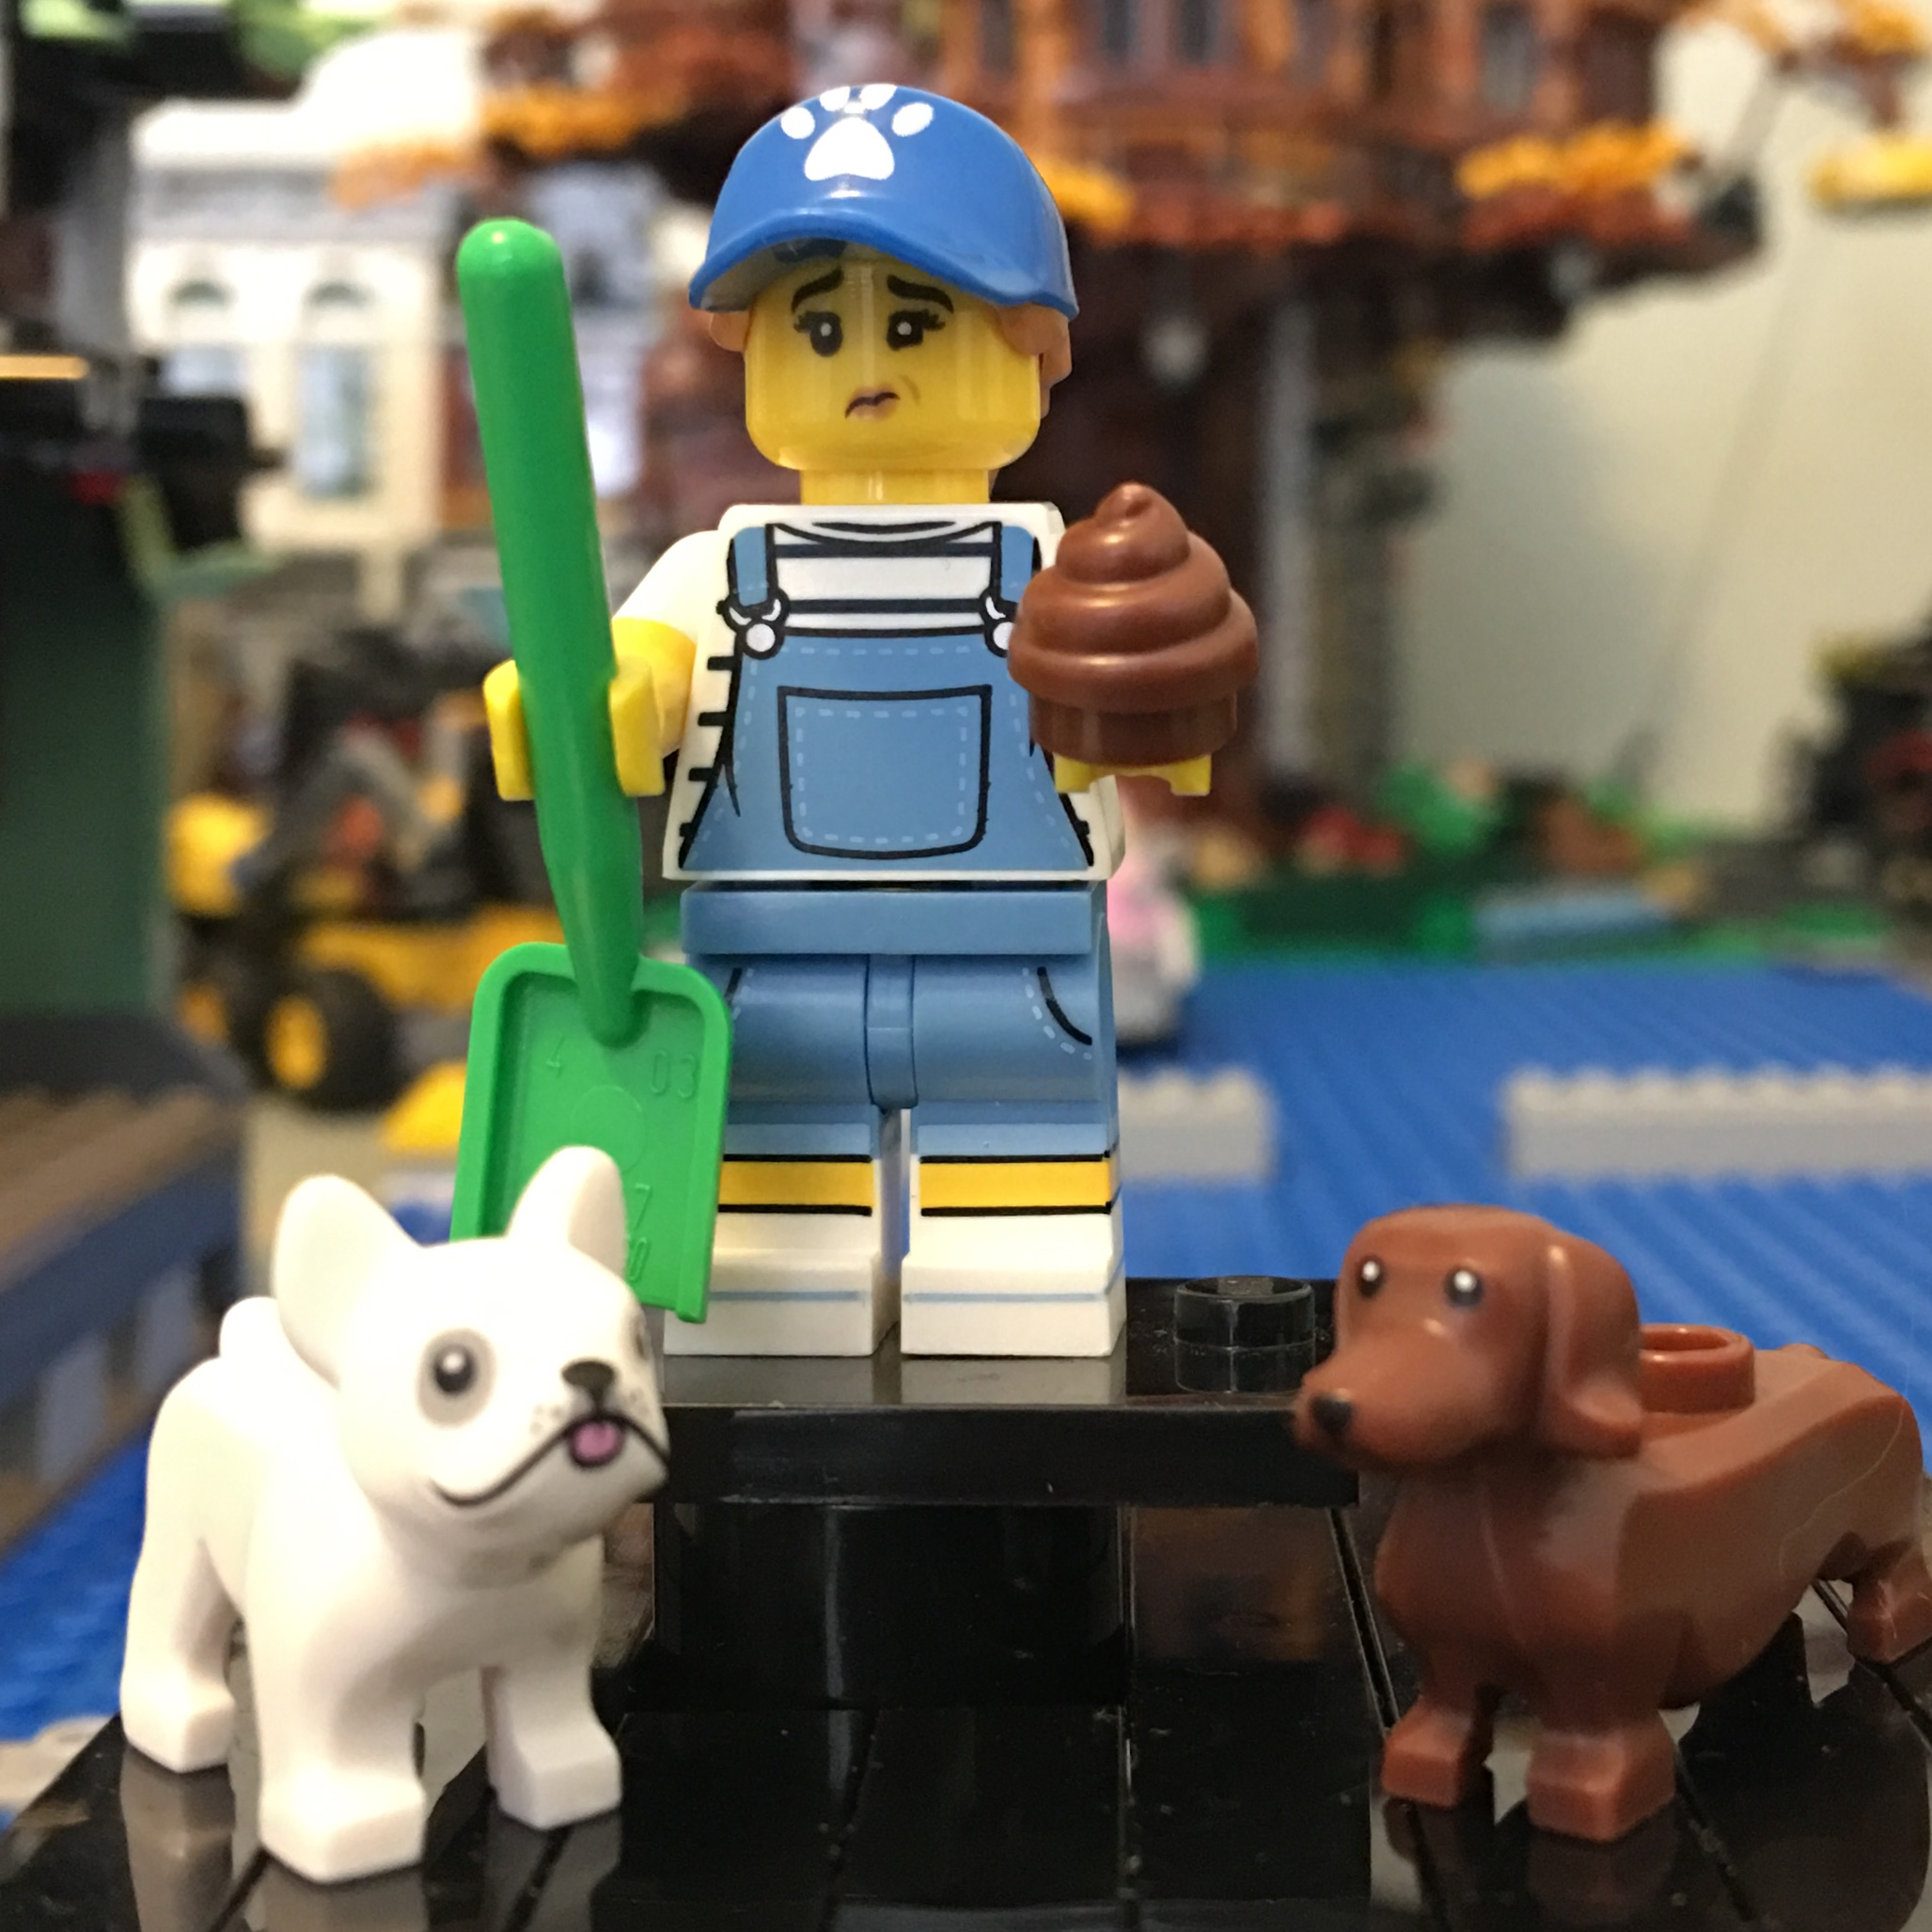 LEGO NEW BLACK TORSO WITH MEDIUM DARK FLESH ARMS SHORT SLEEVES BLACK HANDS PIECE